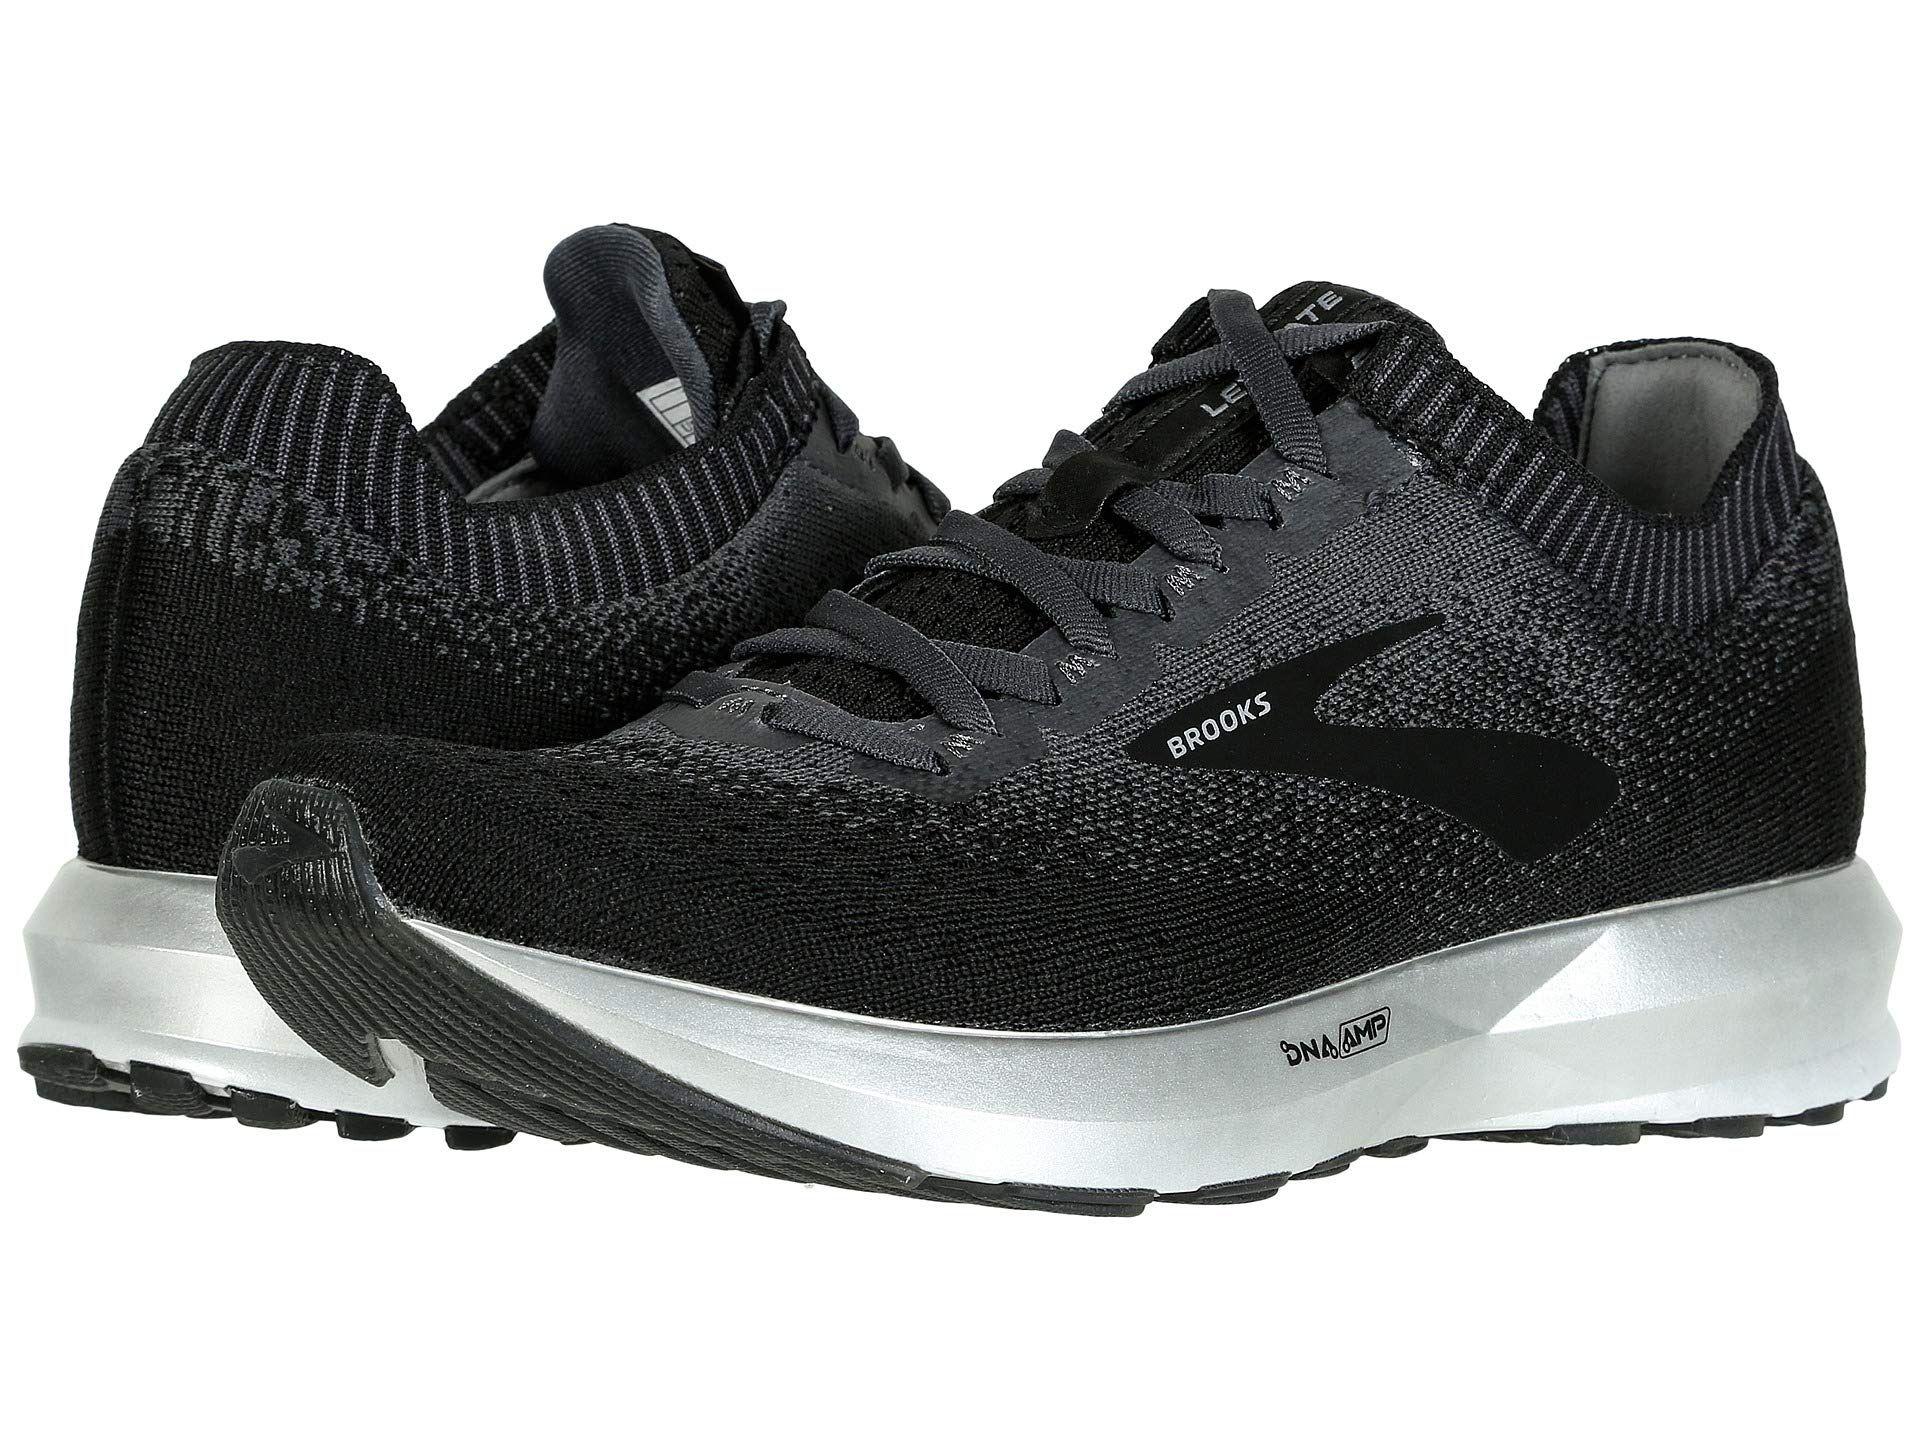 Running Sneakers Sale On Nike, Adidas